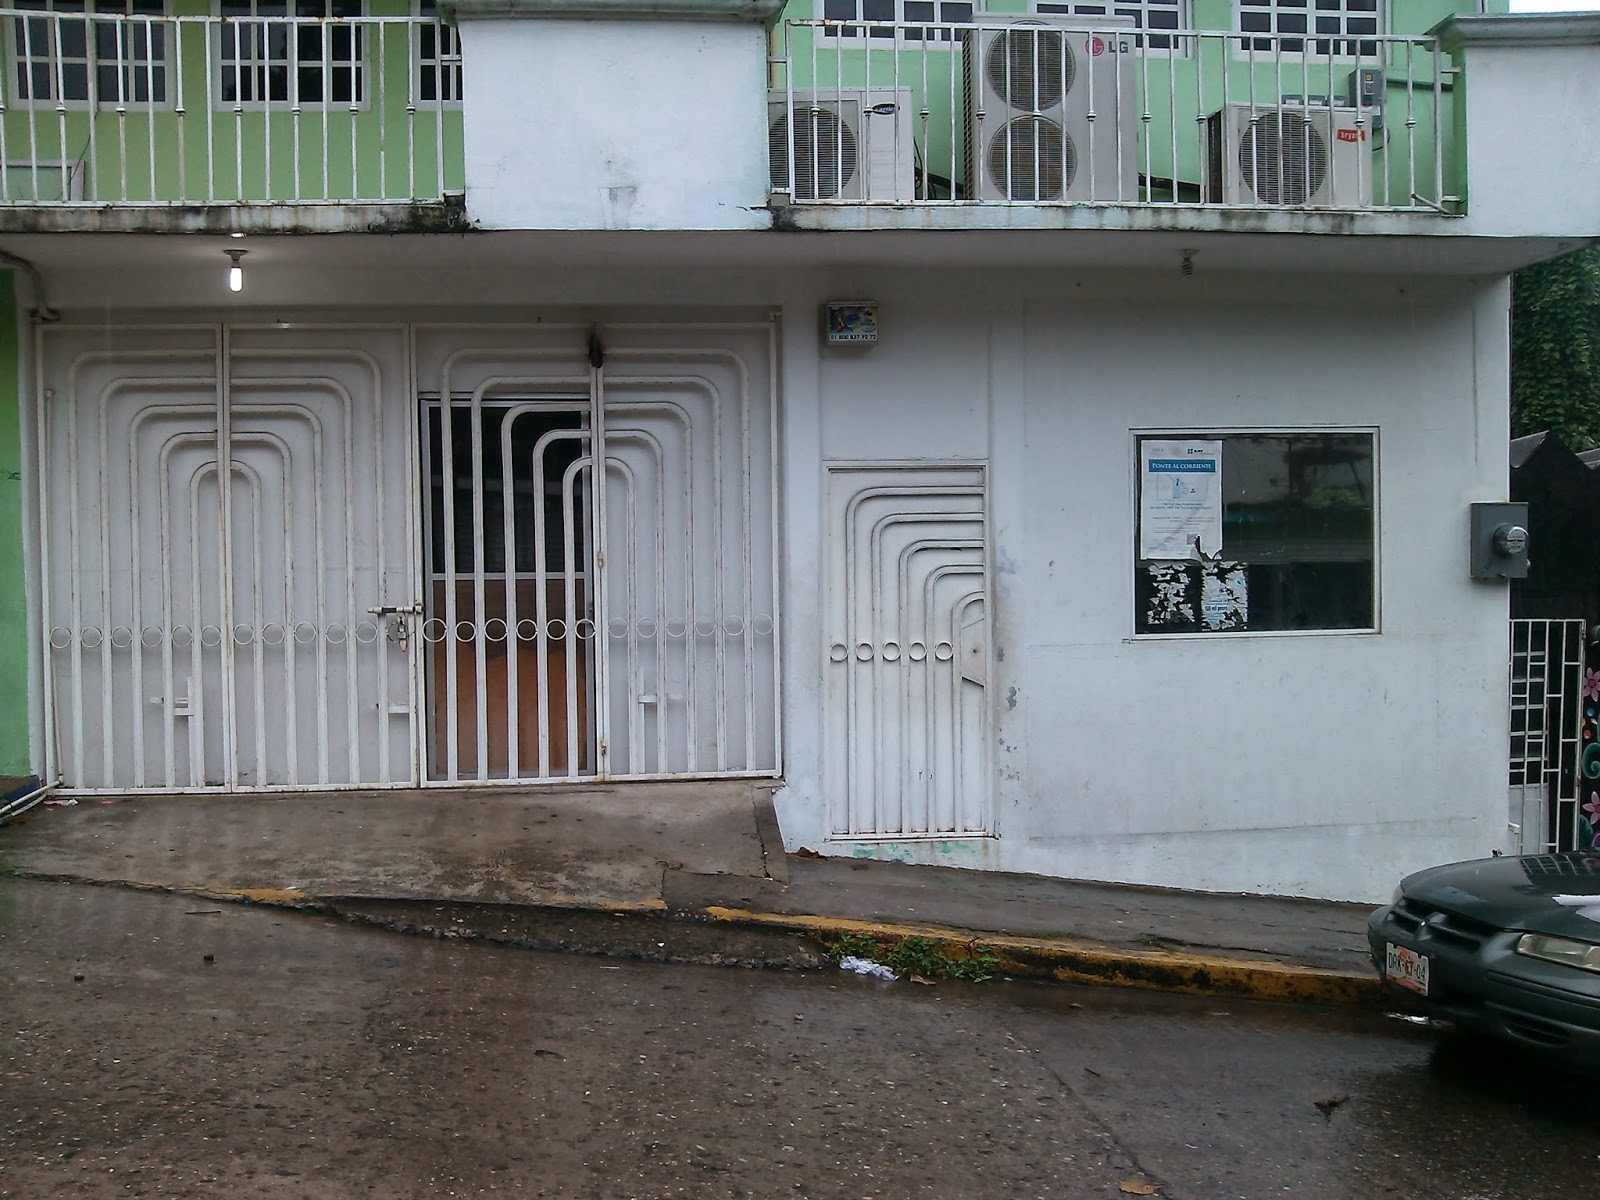 Expresi n revista octubre 2013 for Oficina hacienda